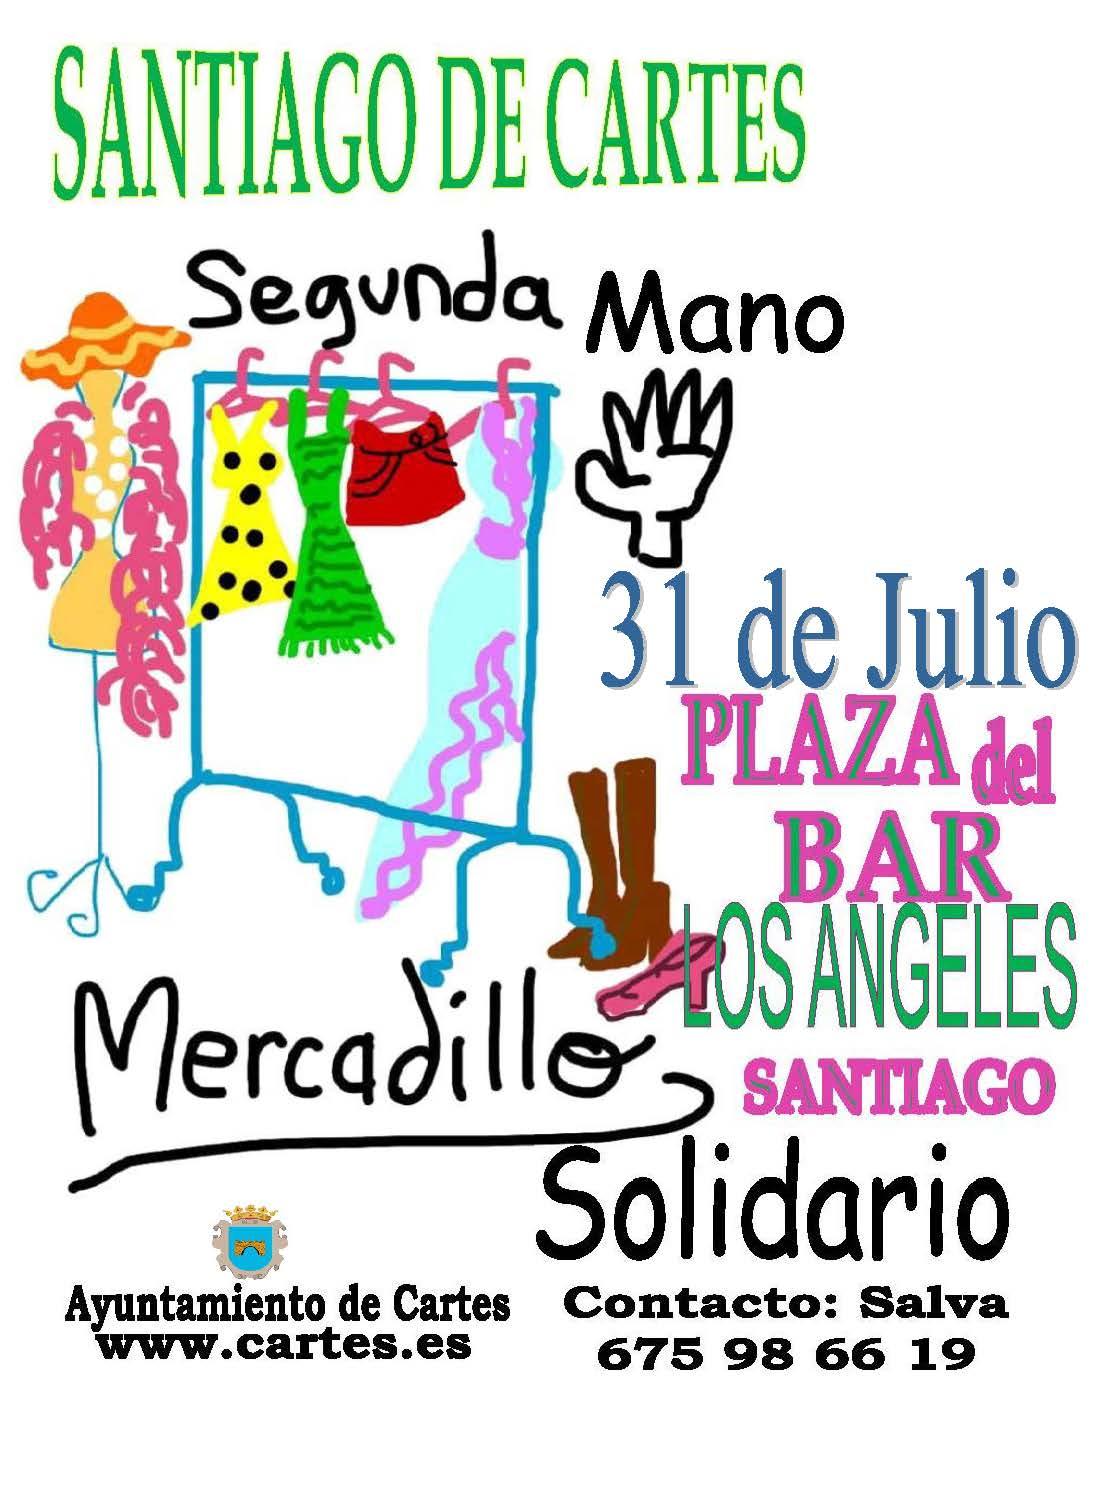 Mercadillo de segunda mano en cartes turismo de cantabria - Mercadillo de segunda mano barcelona ...